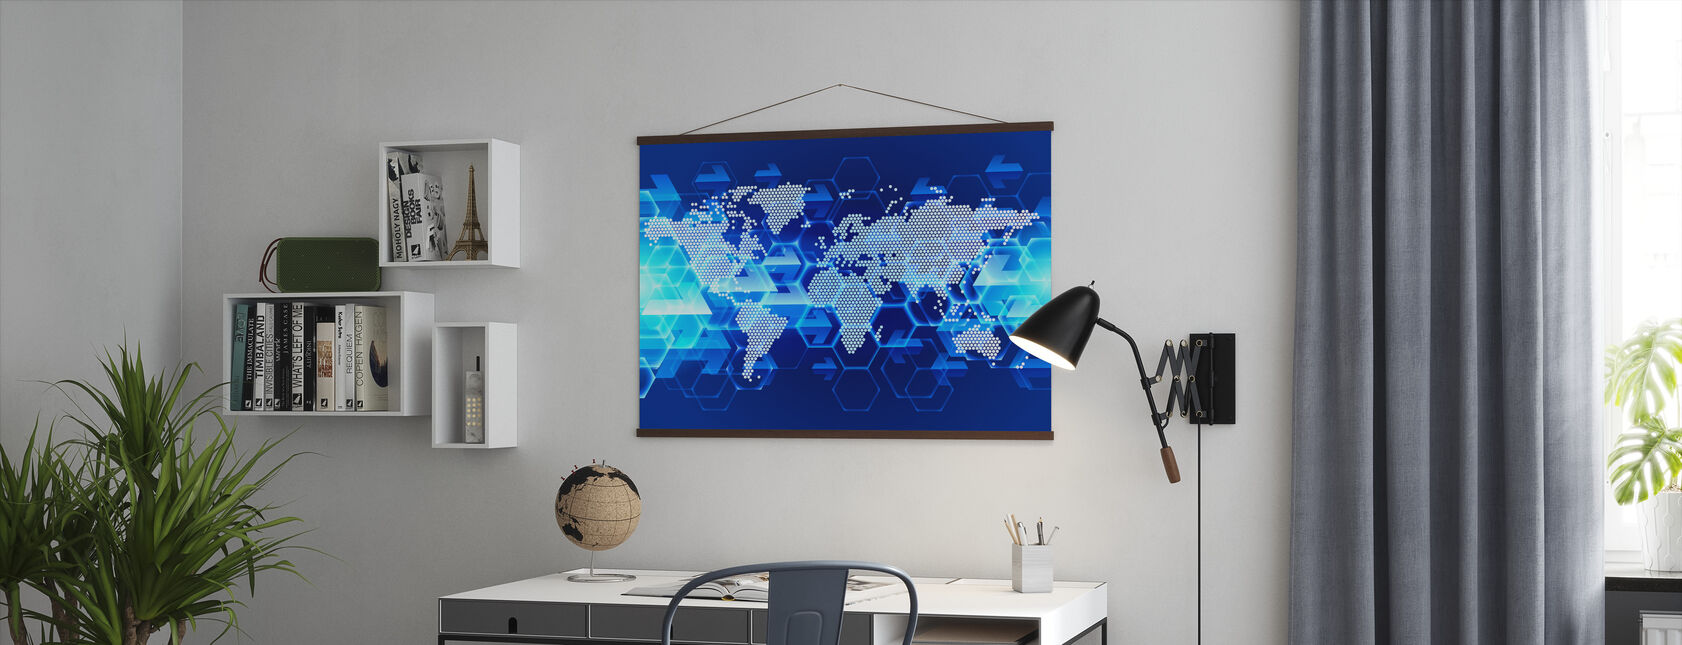 Blue Light World Map - Poster - Office